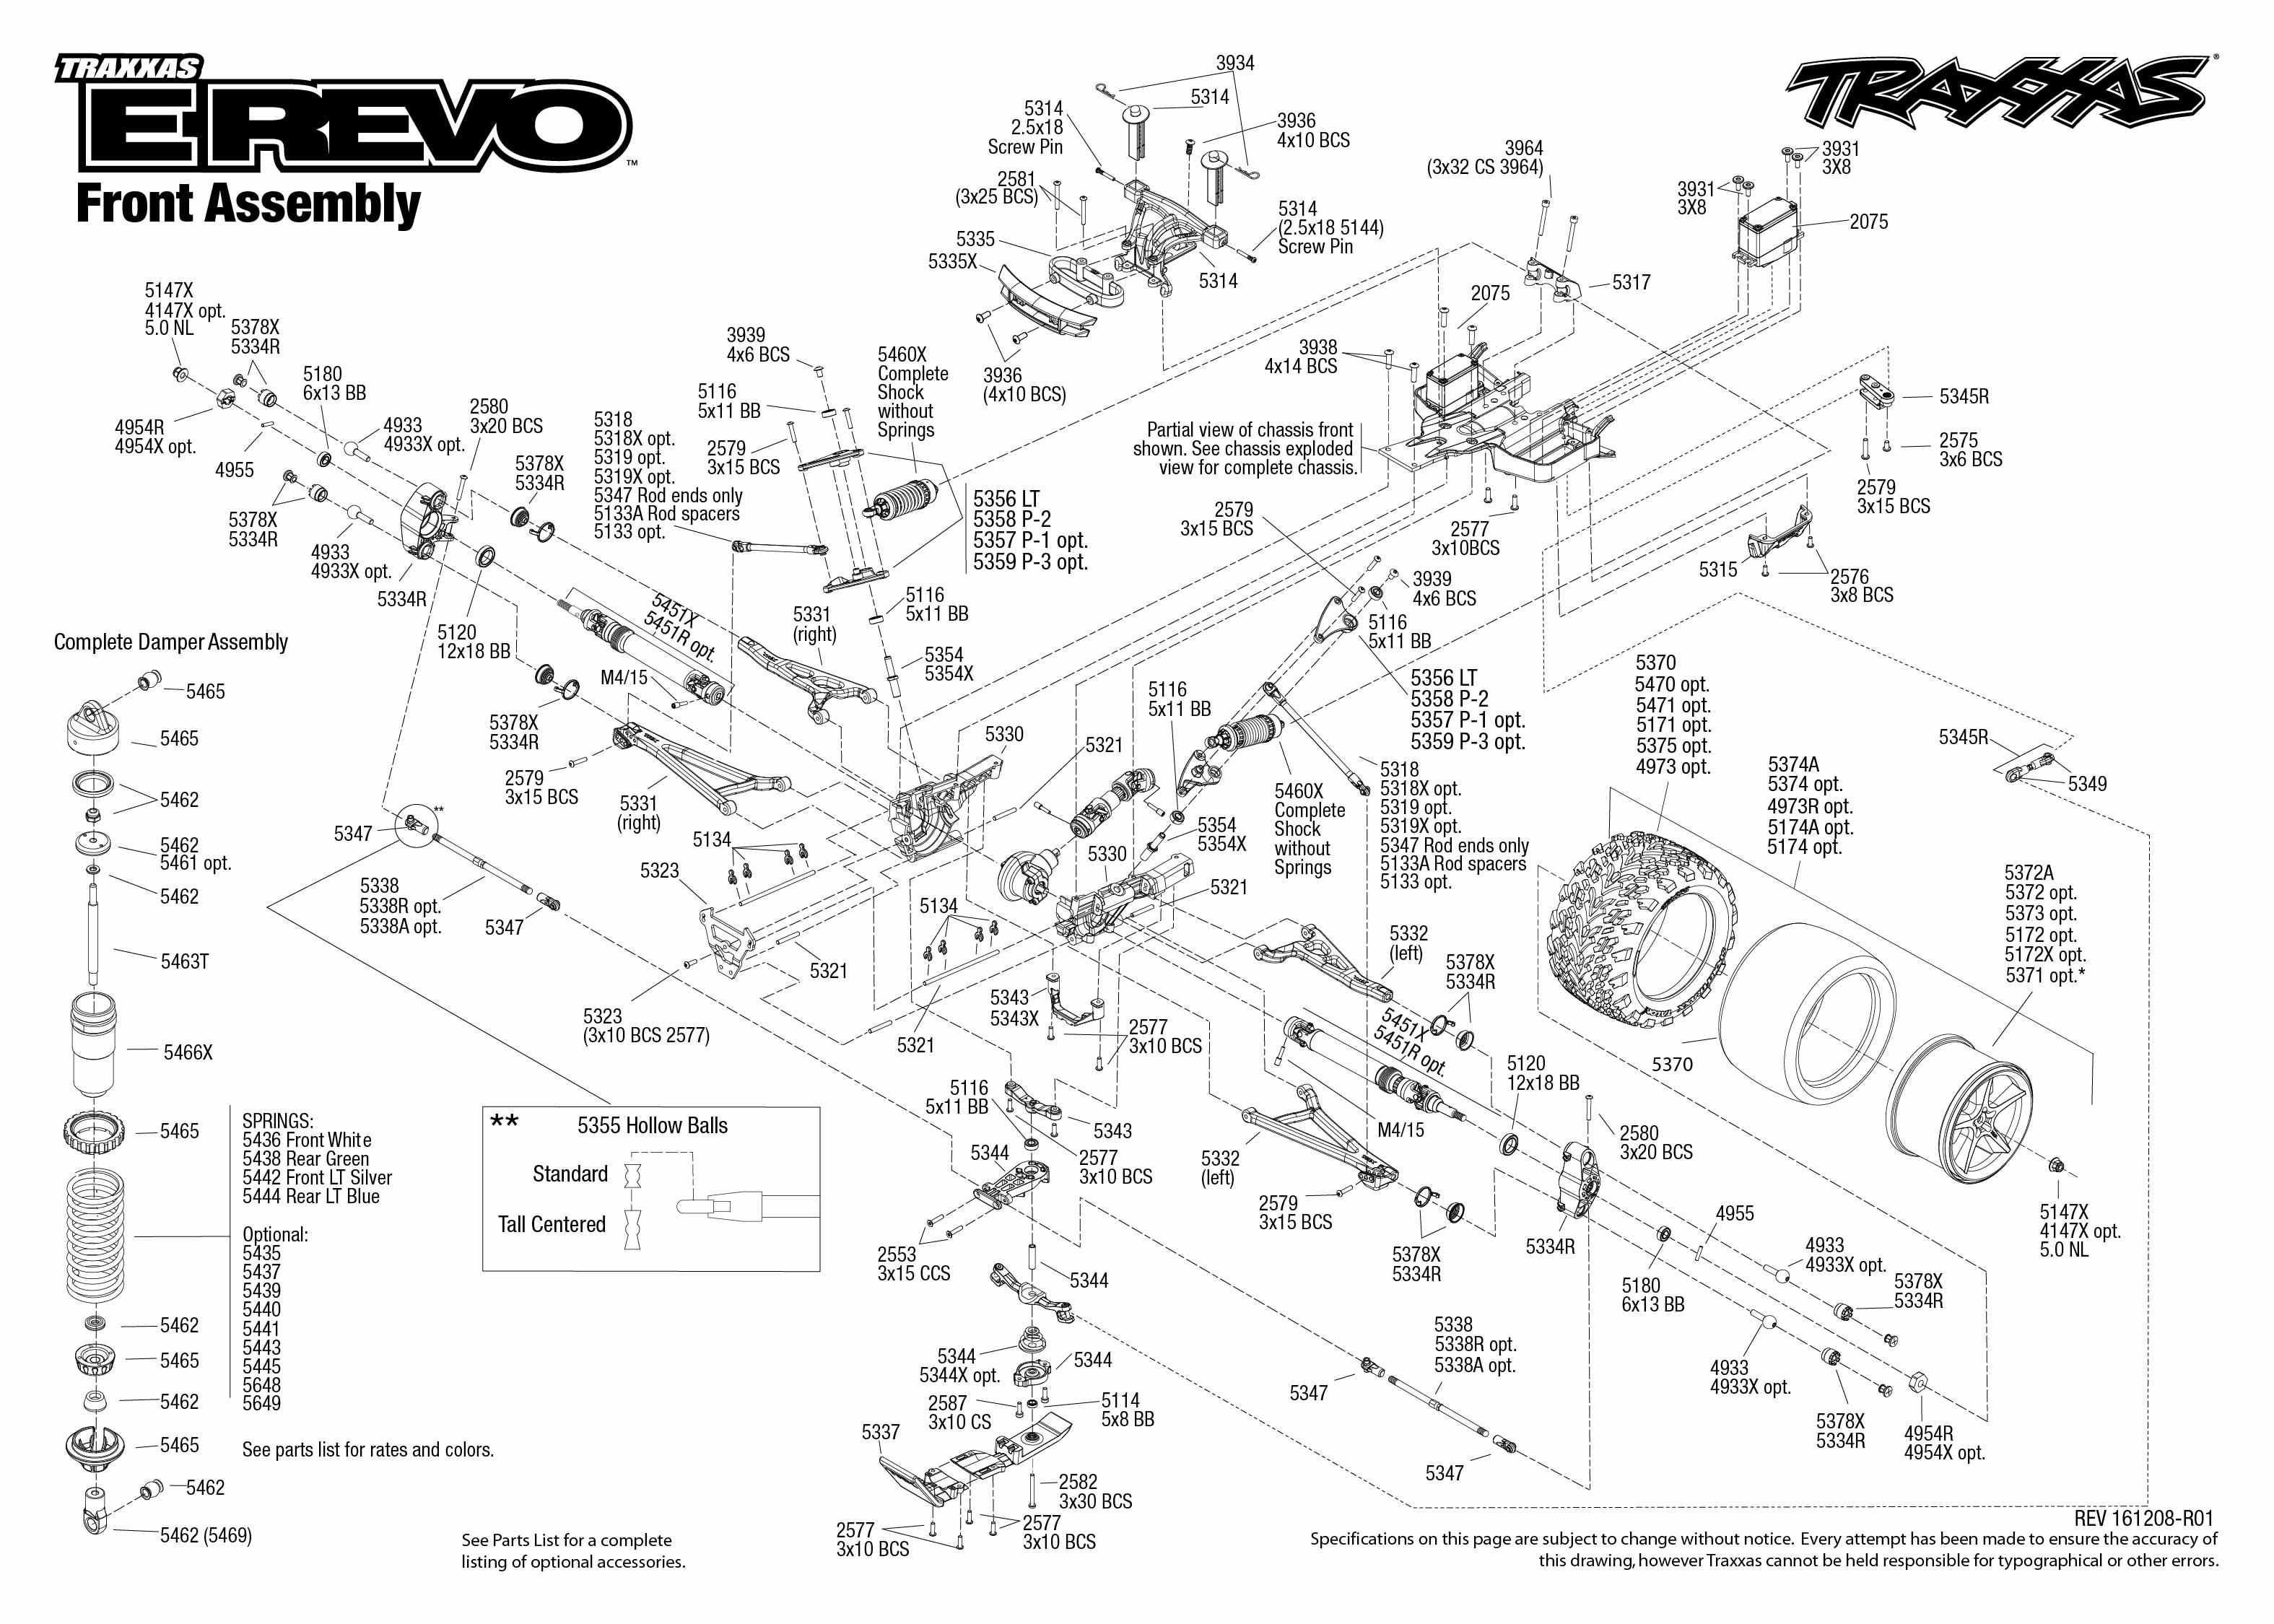 Traxxas Revo Wire Diagram 25 Wiring Images Jada Rc Car Fronth5a59d10978439a3356cd489d627a188a E